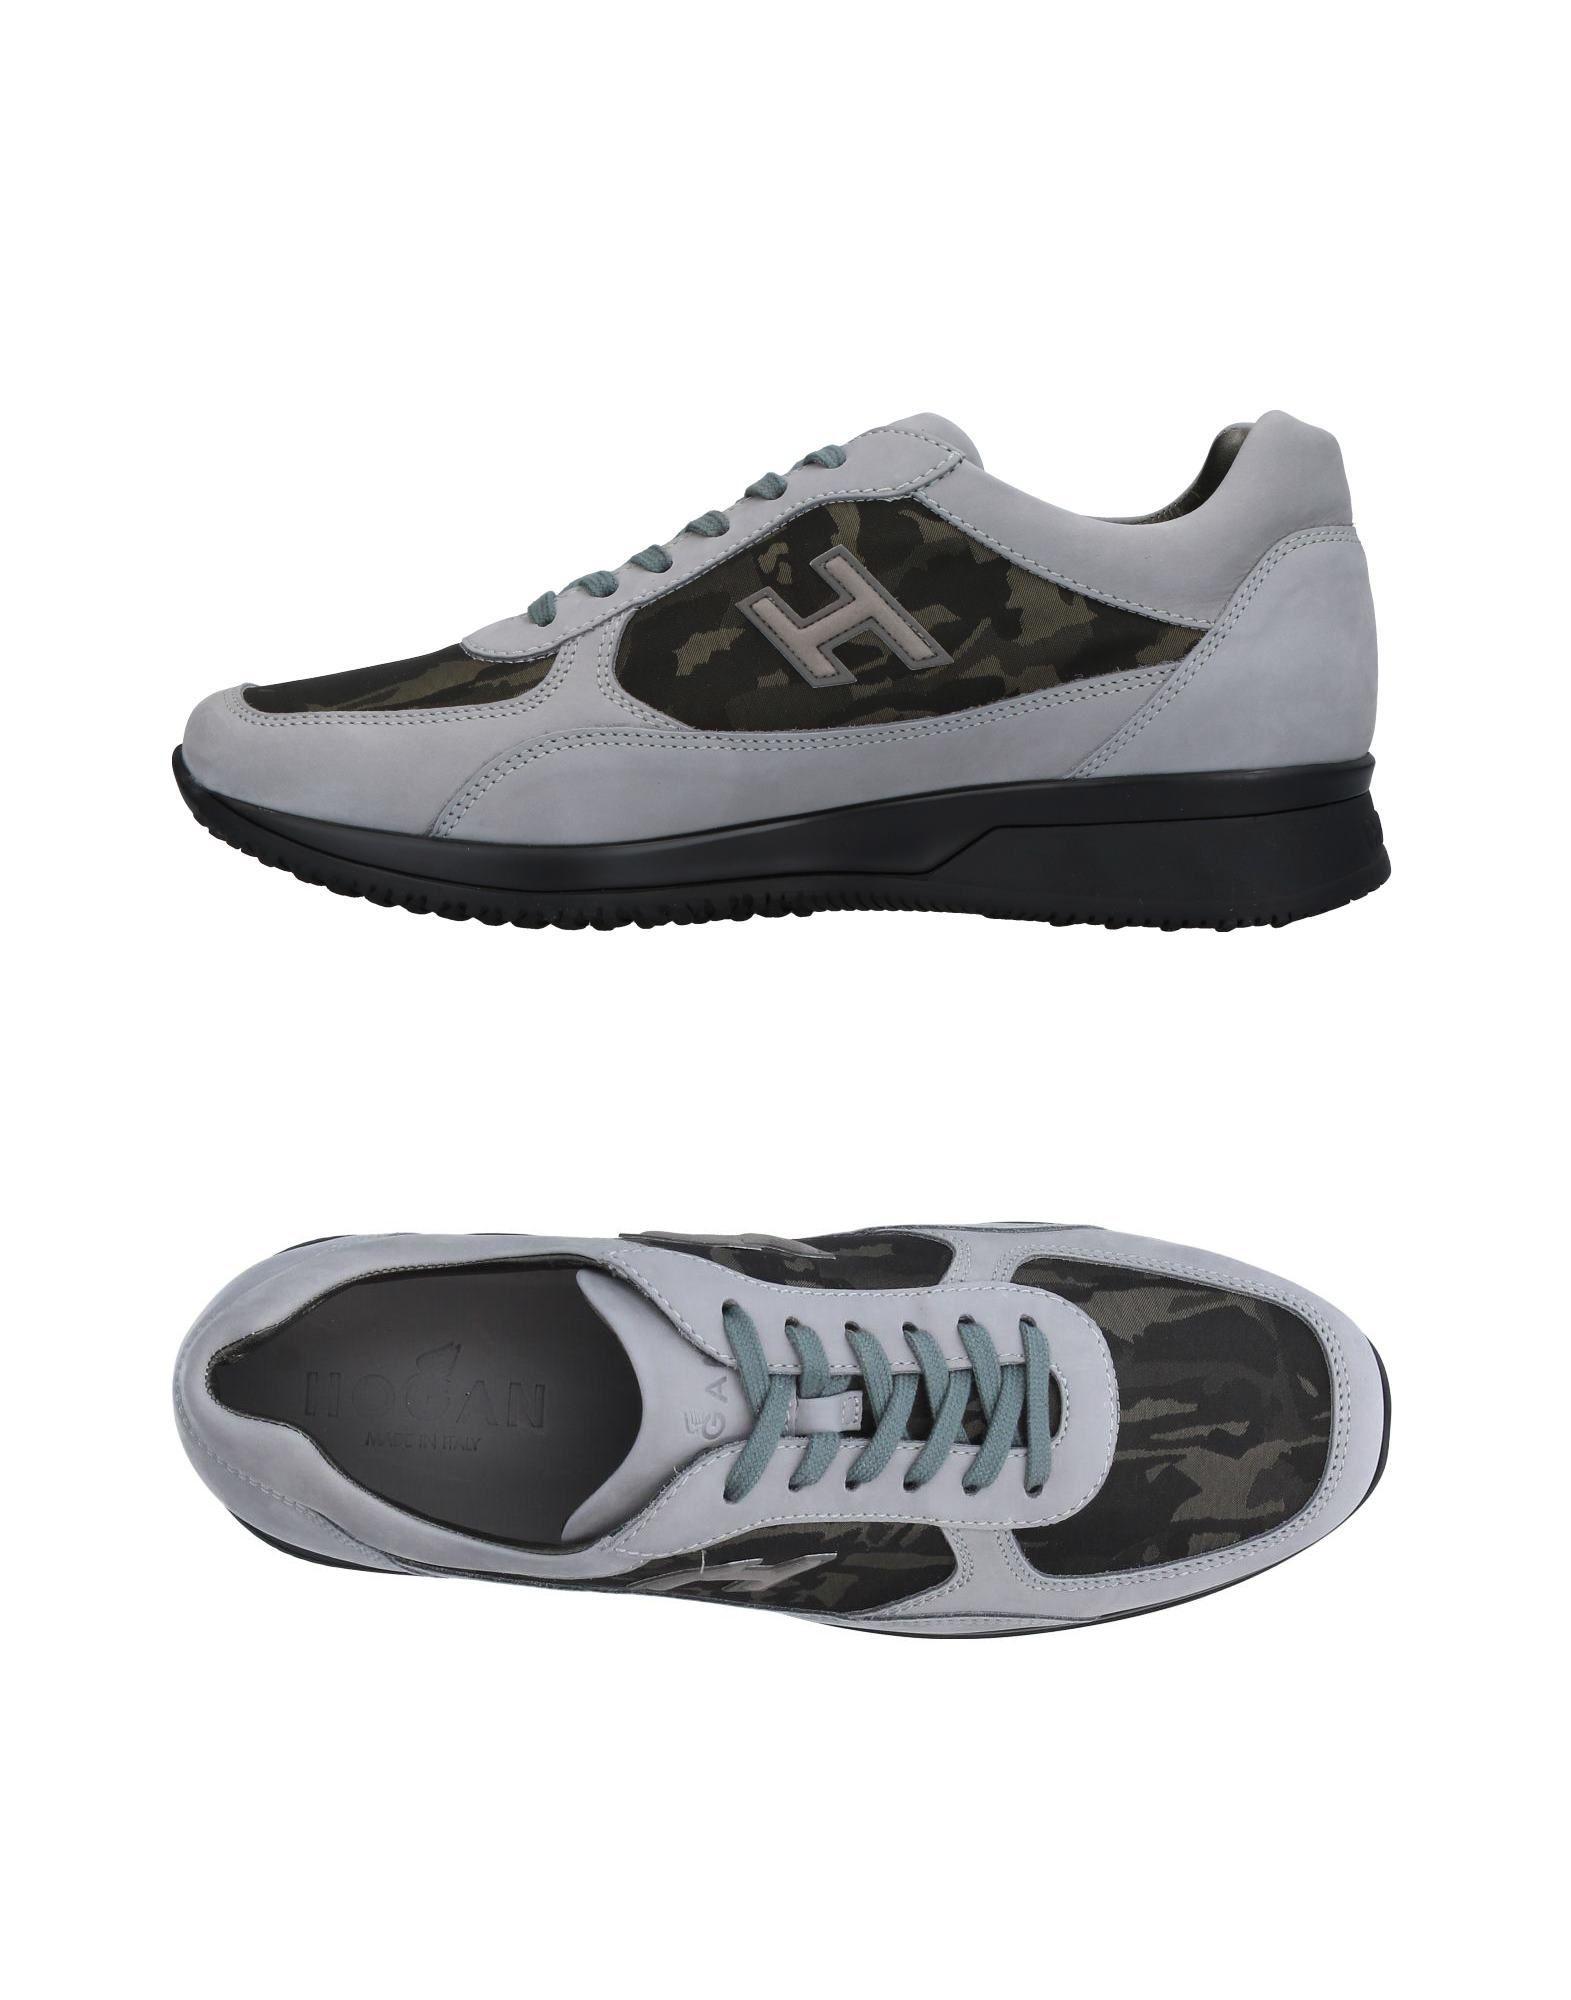 Hogan Sneakers Herren  11366352CL Gute Qualität beliebte Schuhe